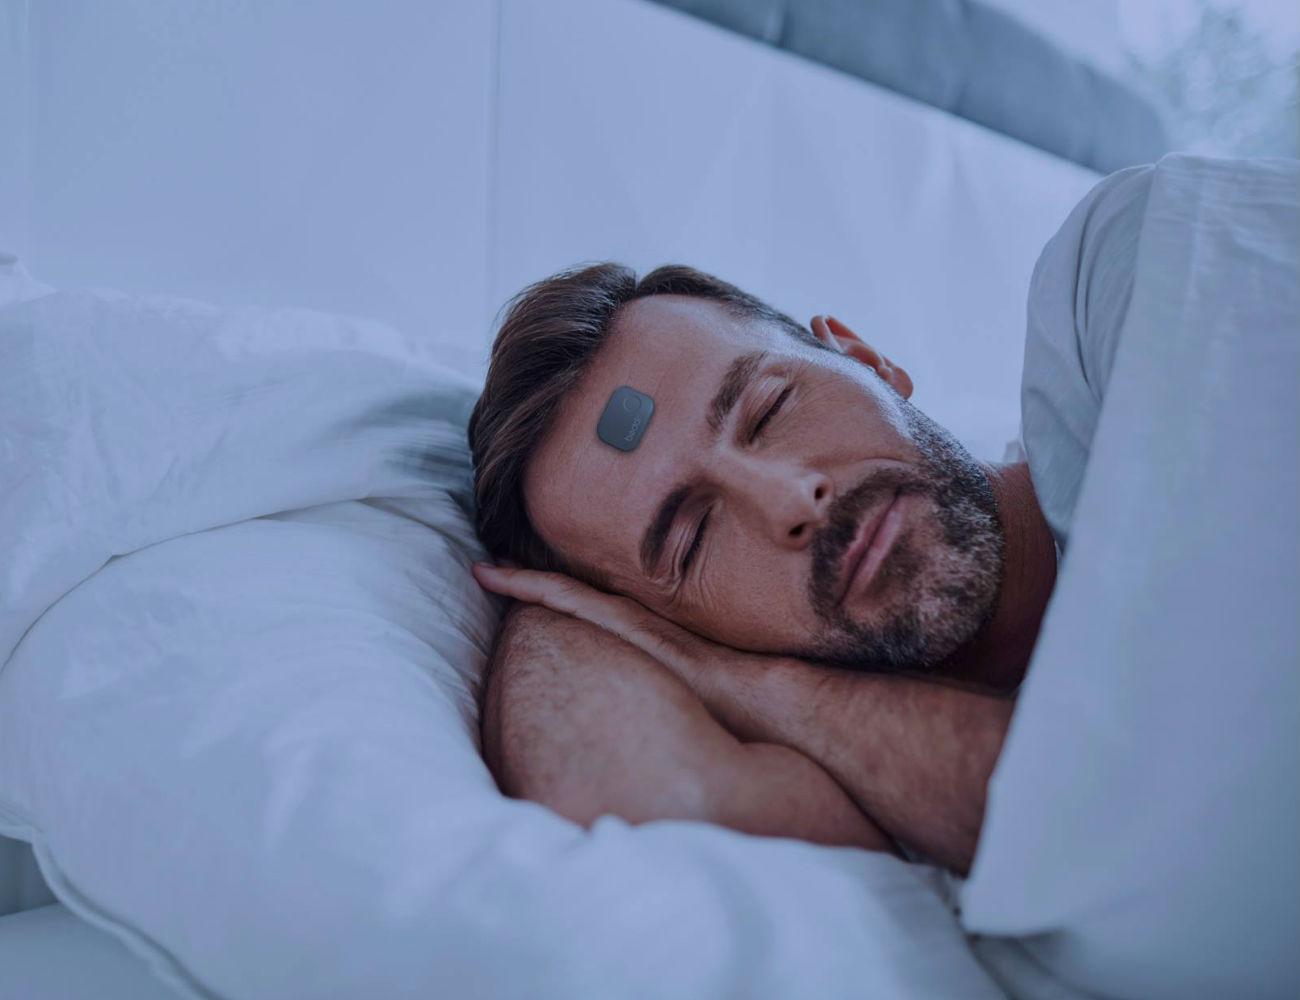 10 Sleep tech gadgets to help you get some shuteye - beddr 01